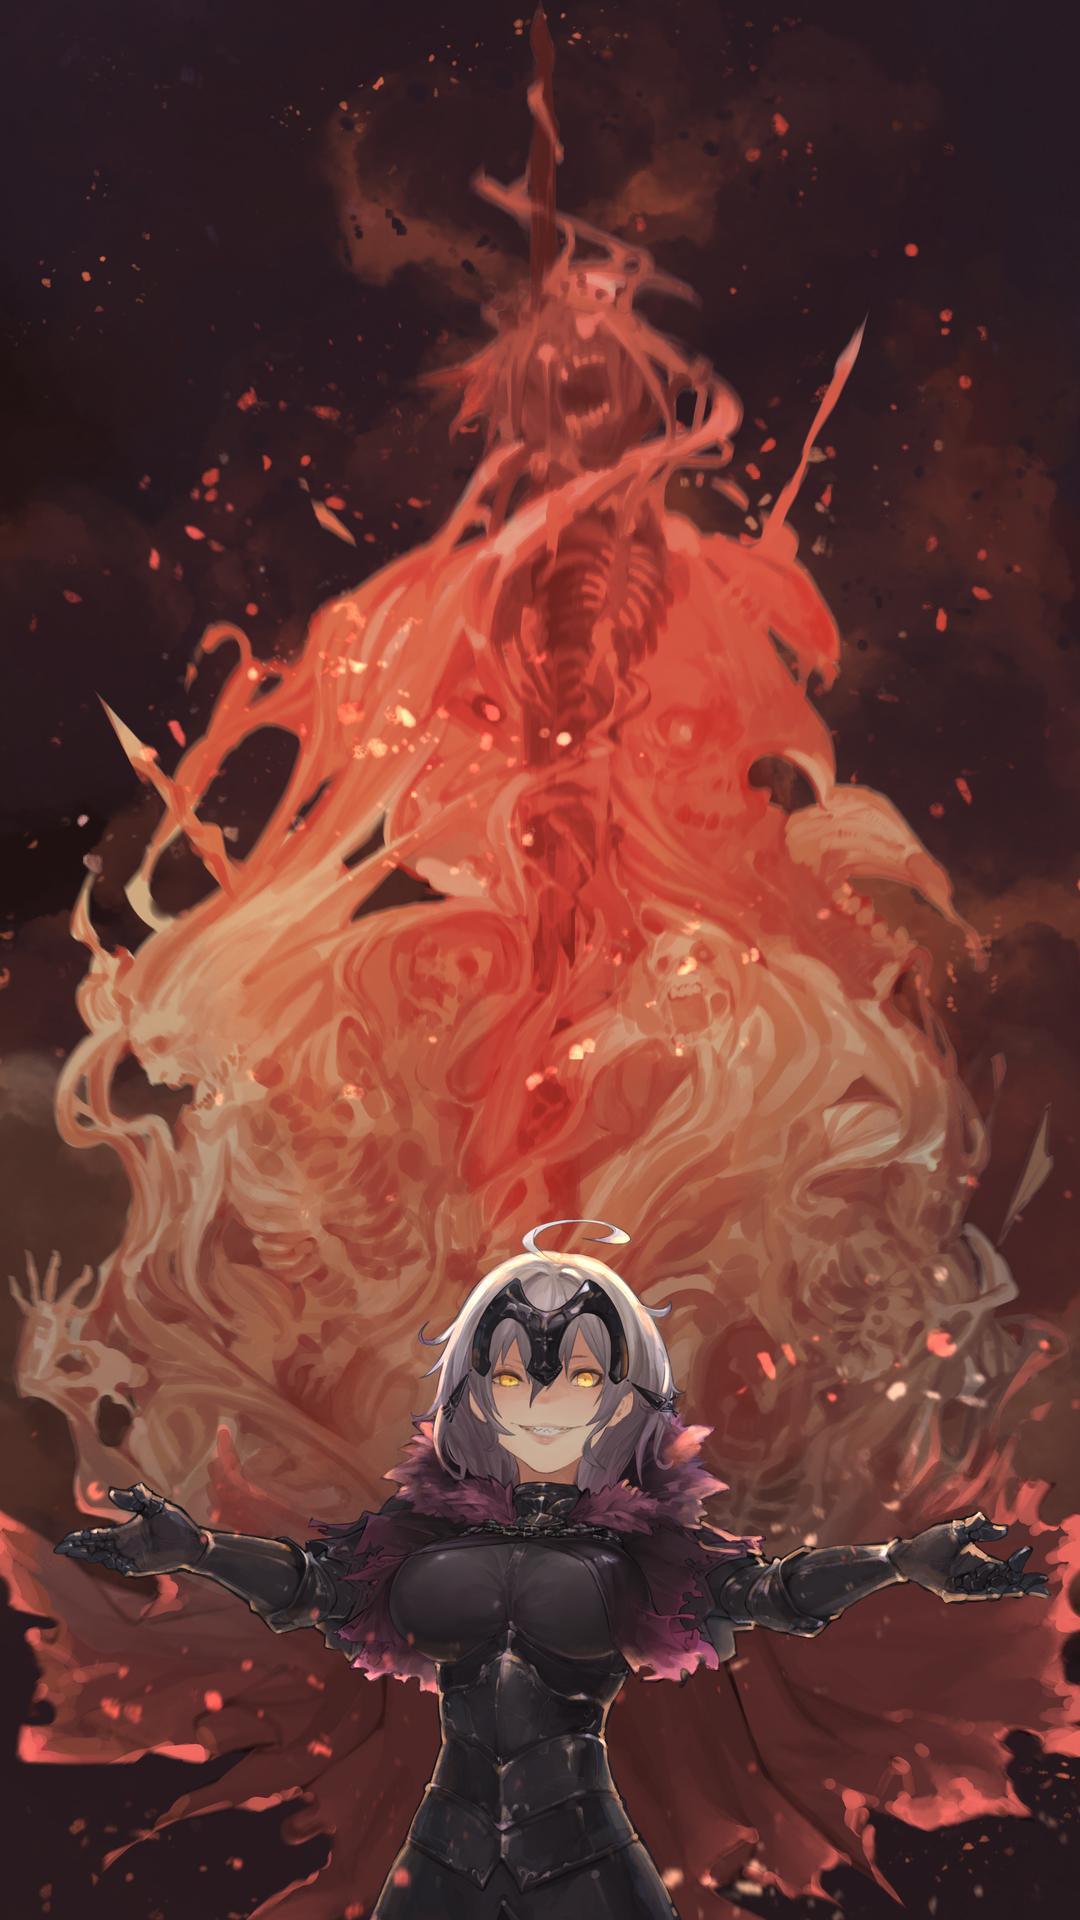 Wallpaper Anime Girls Fate Grand Order Jeanne Alter Fate Grand